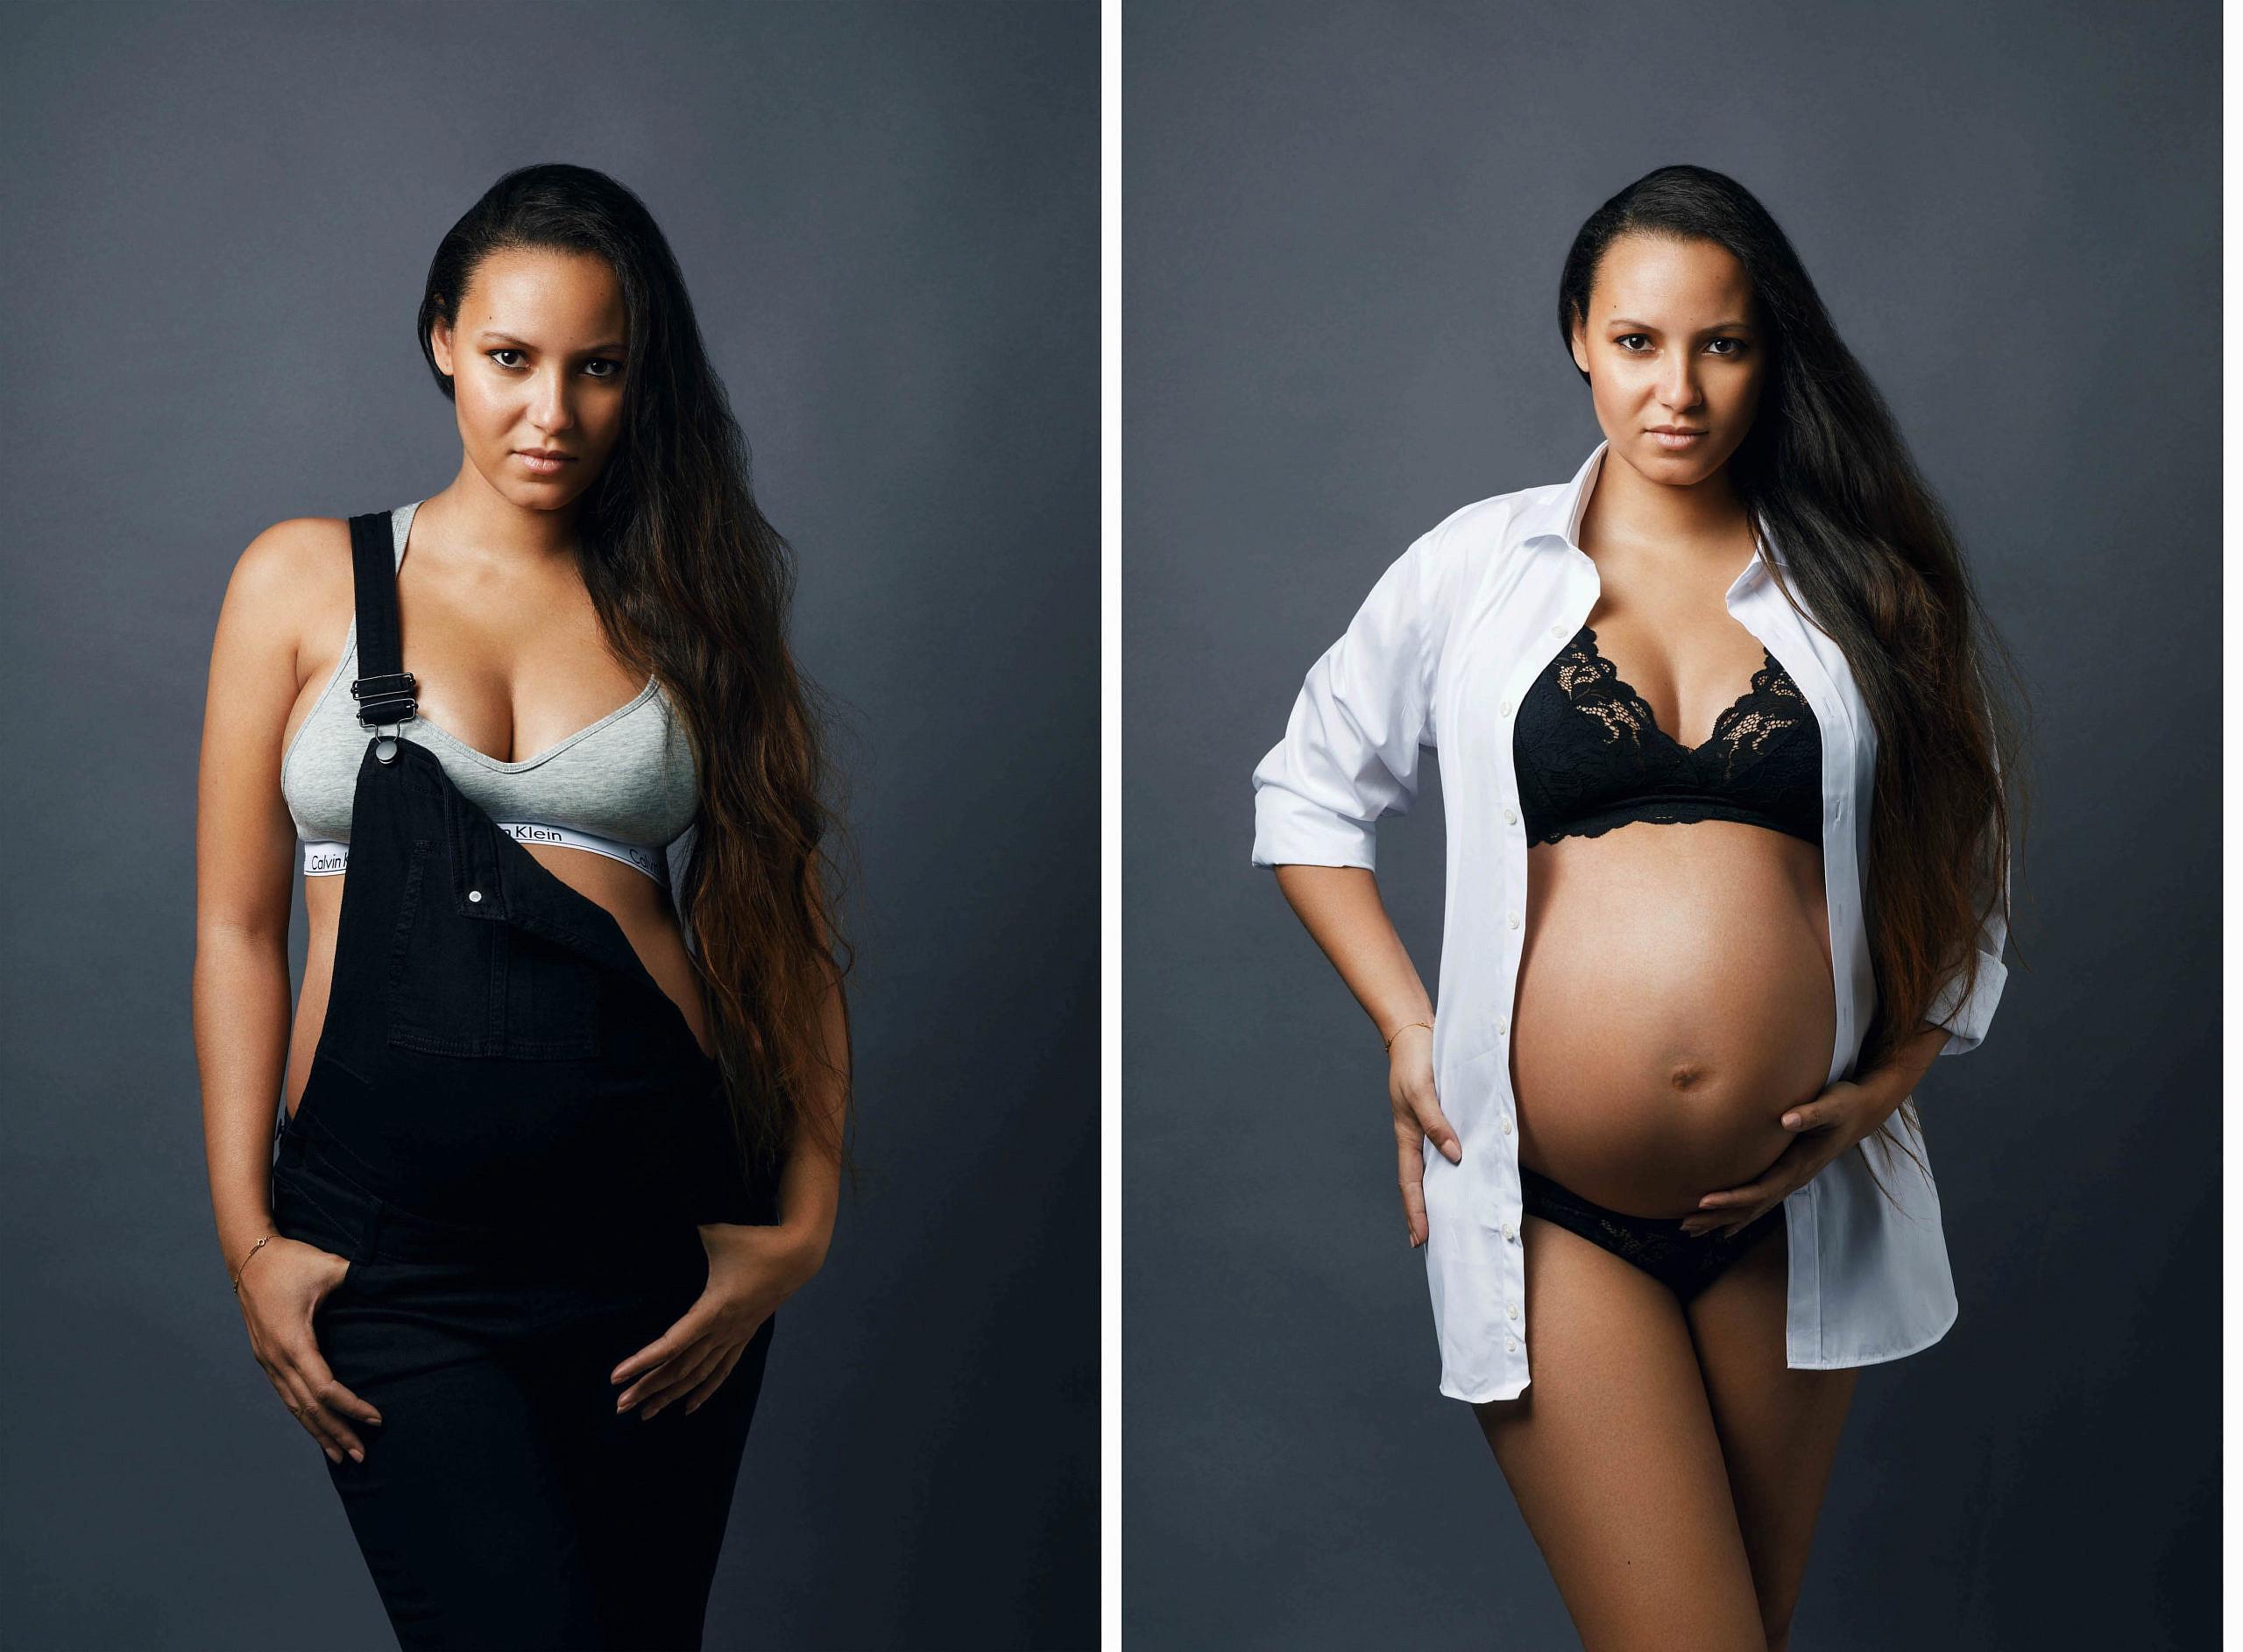 Photographe-femme-enceinte-grossesse-en-chemise-et-sous-vetement-photo-studio-salopette